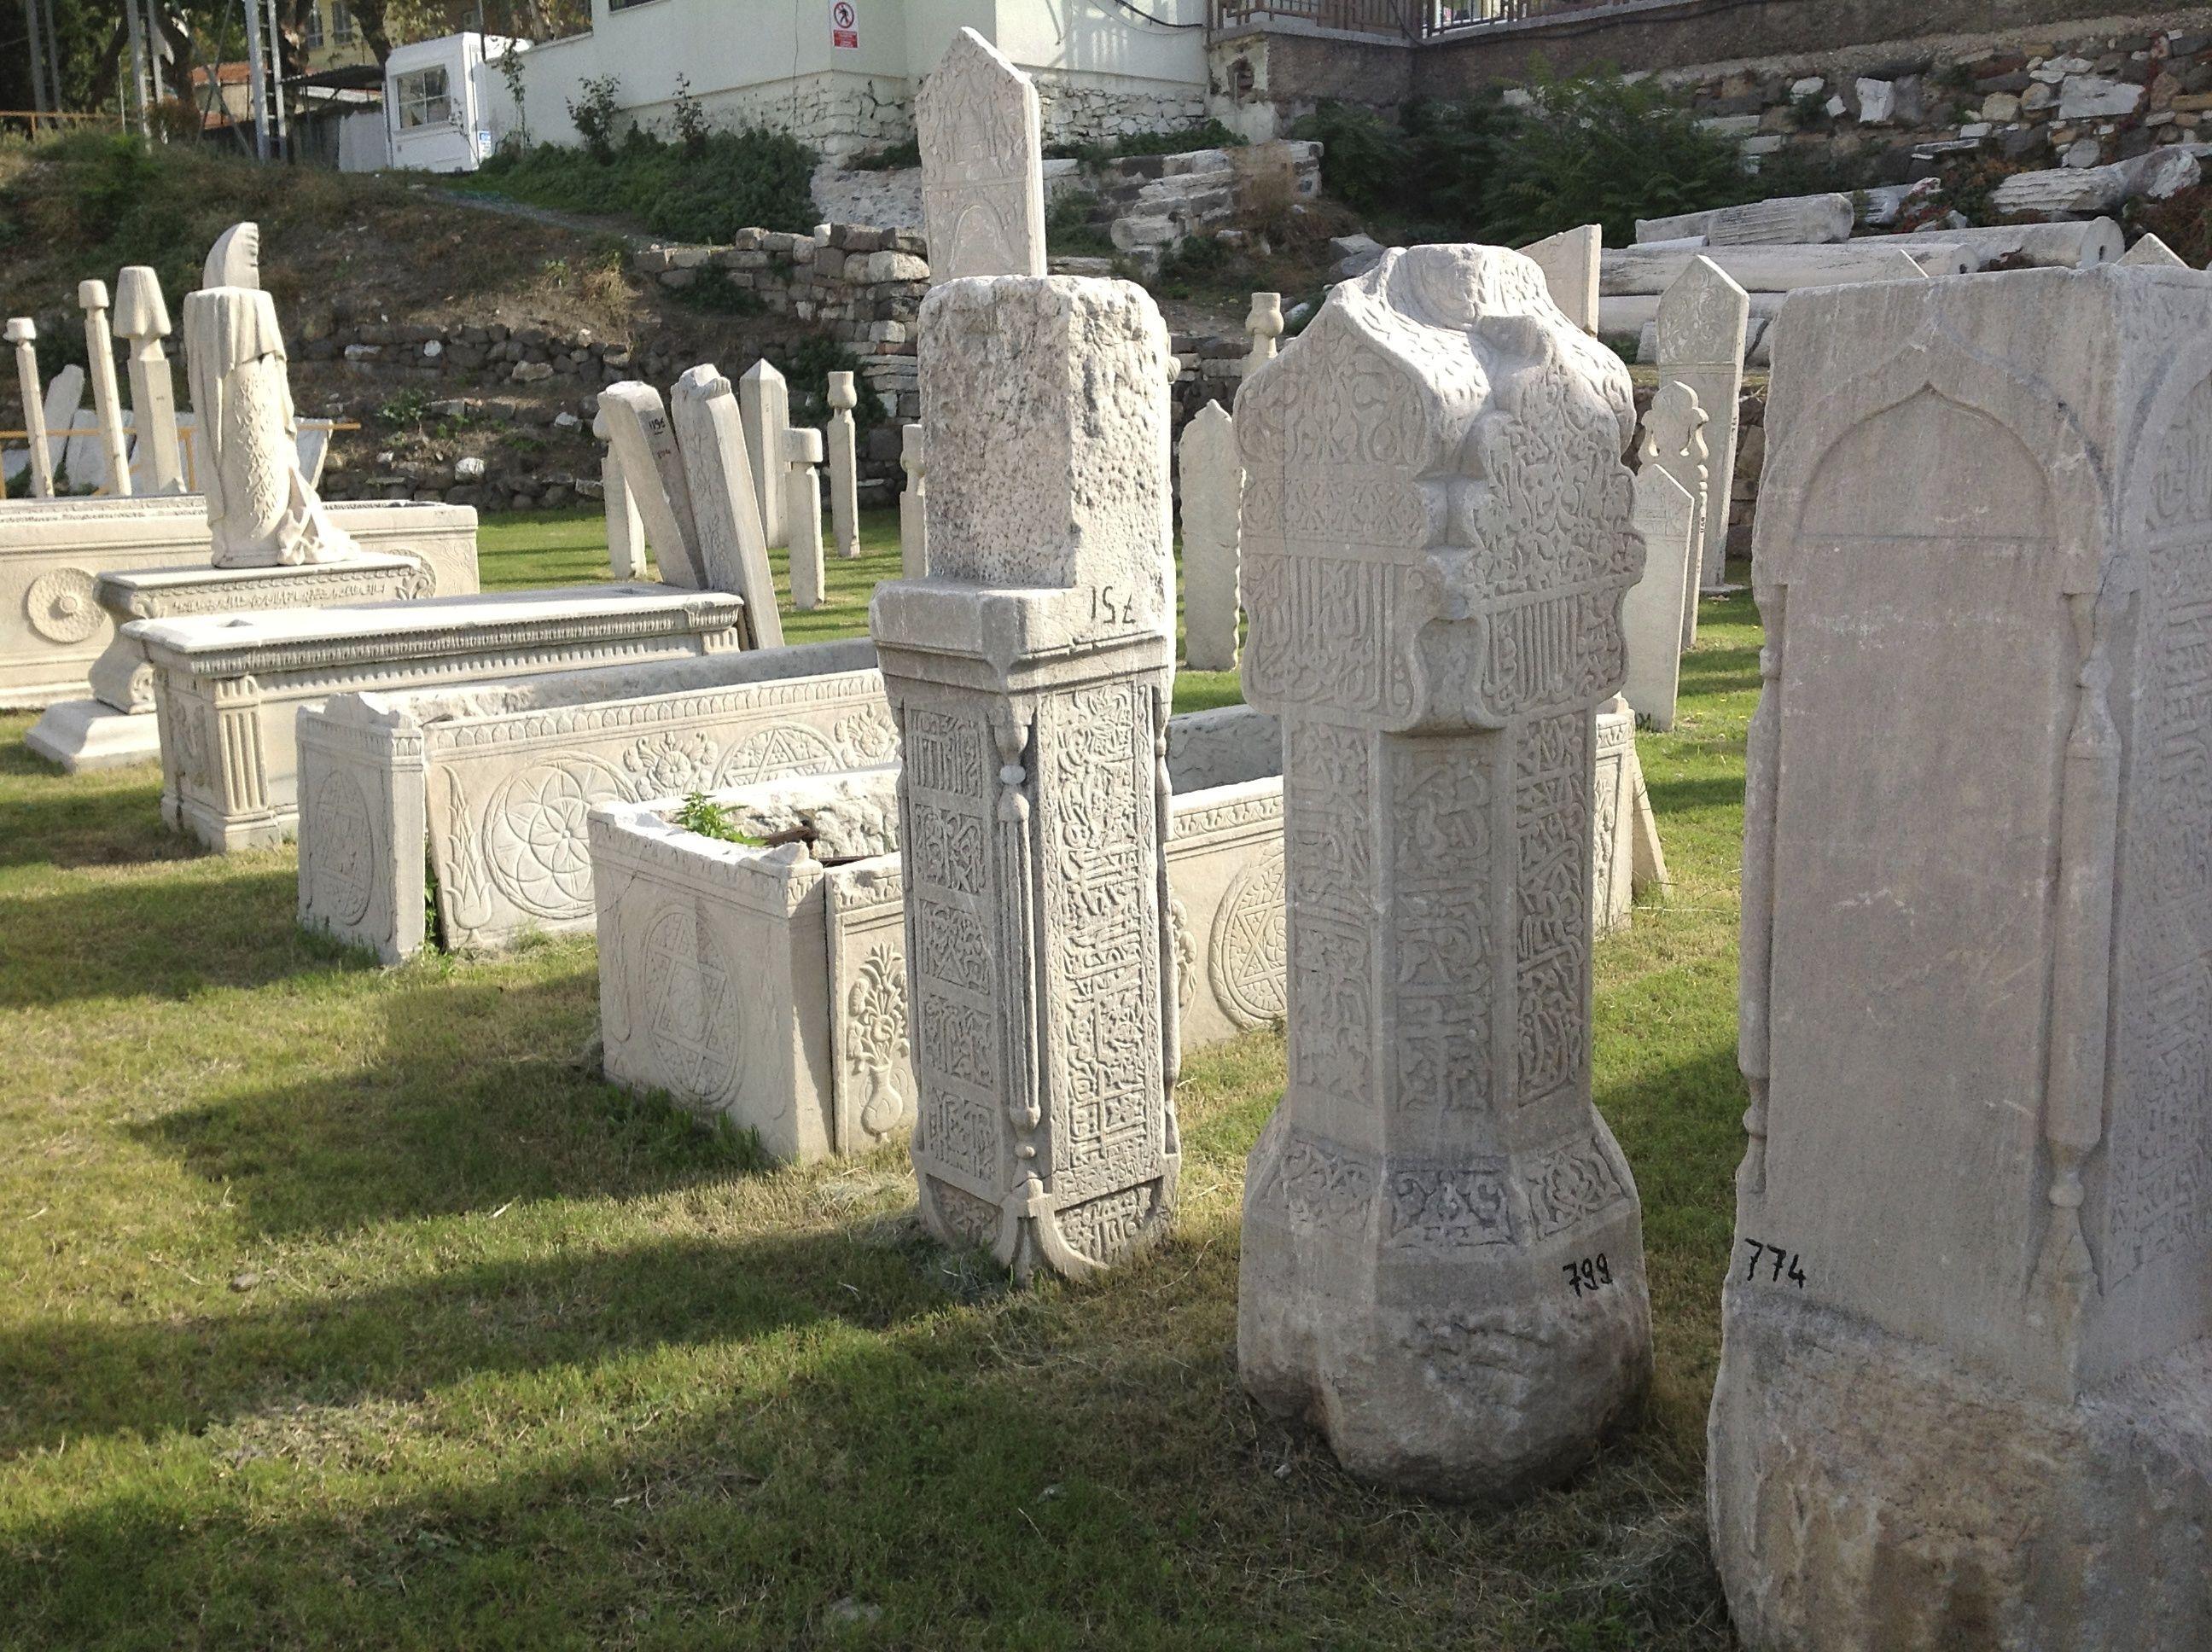 Ottoman period funerary headstones in Izmir (ancient Smyrna agora) (Photo P. Hunt 2012)